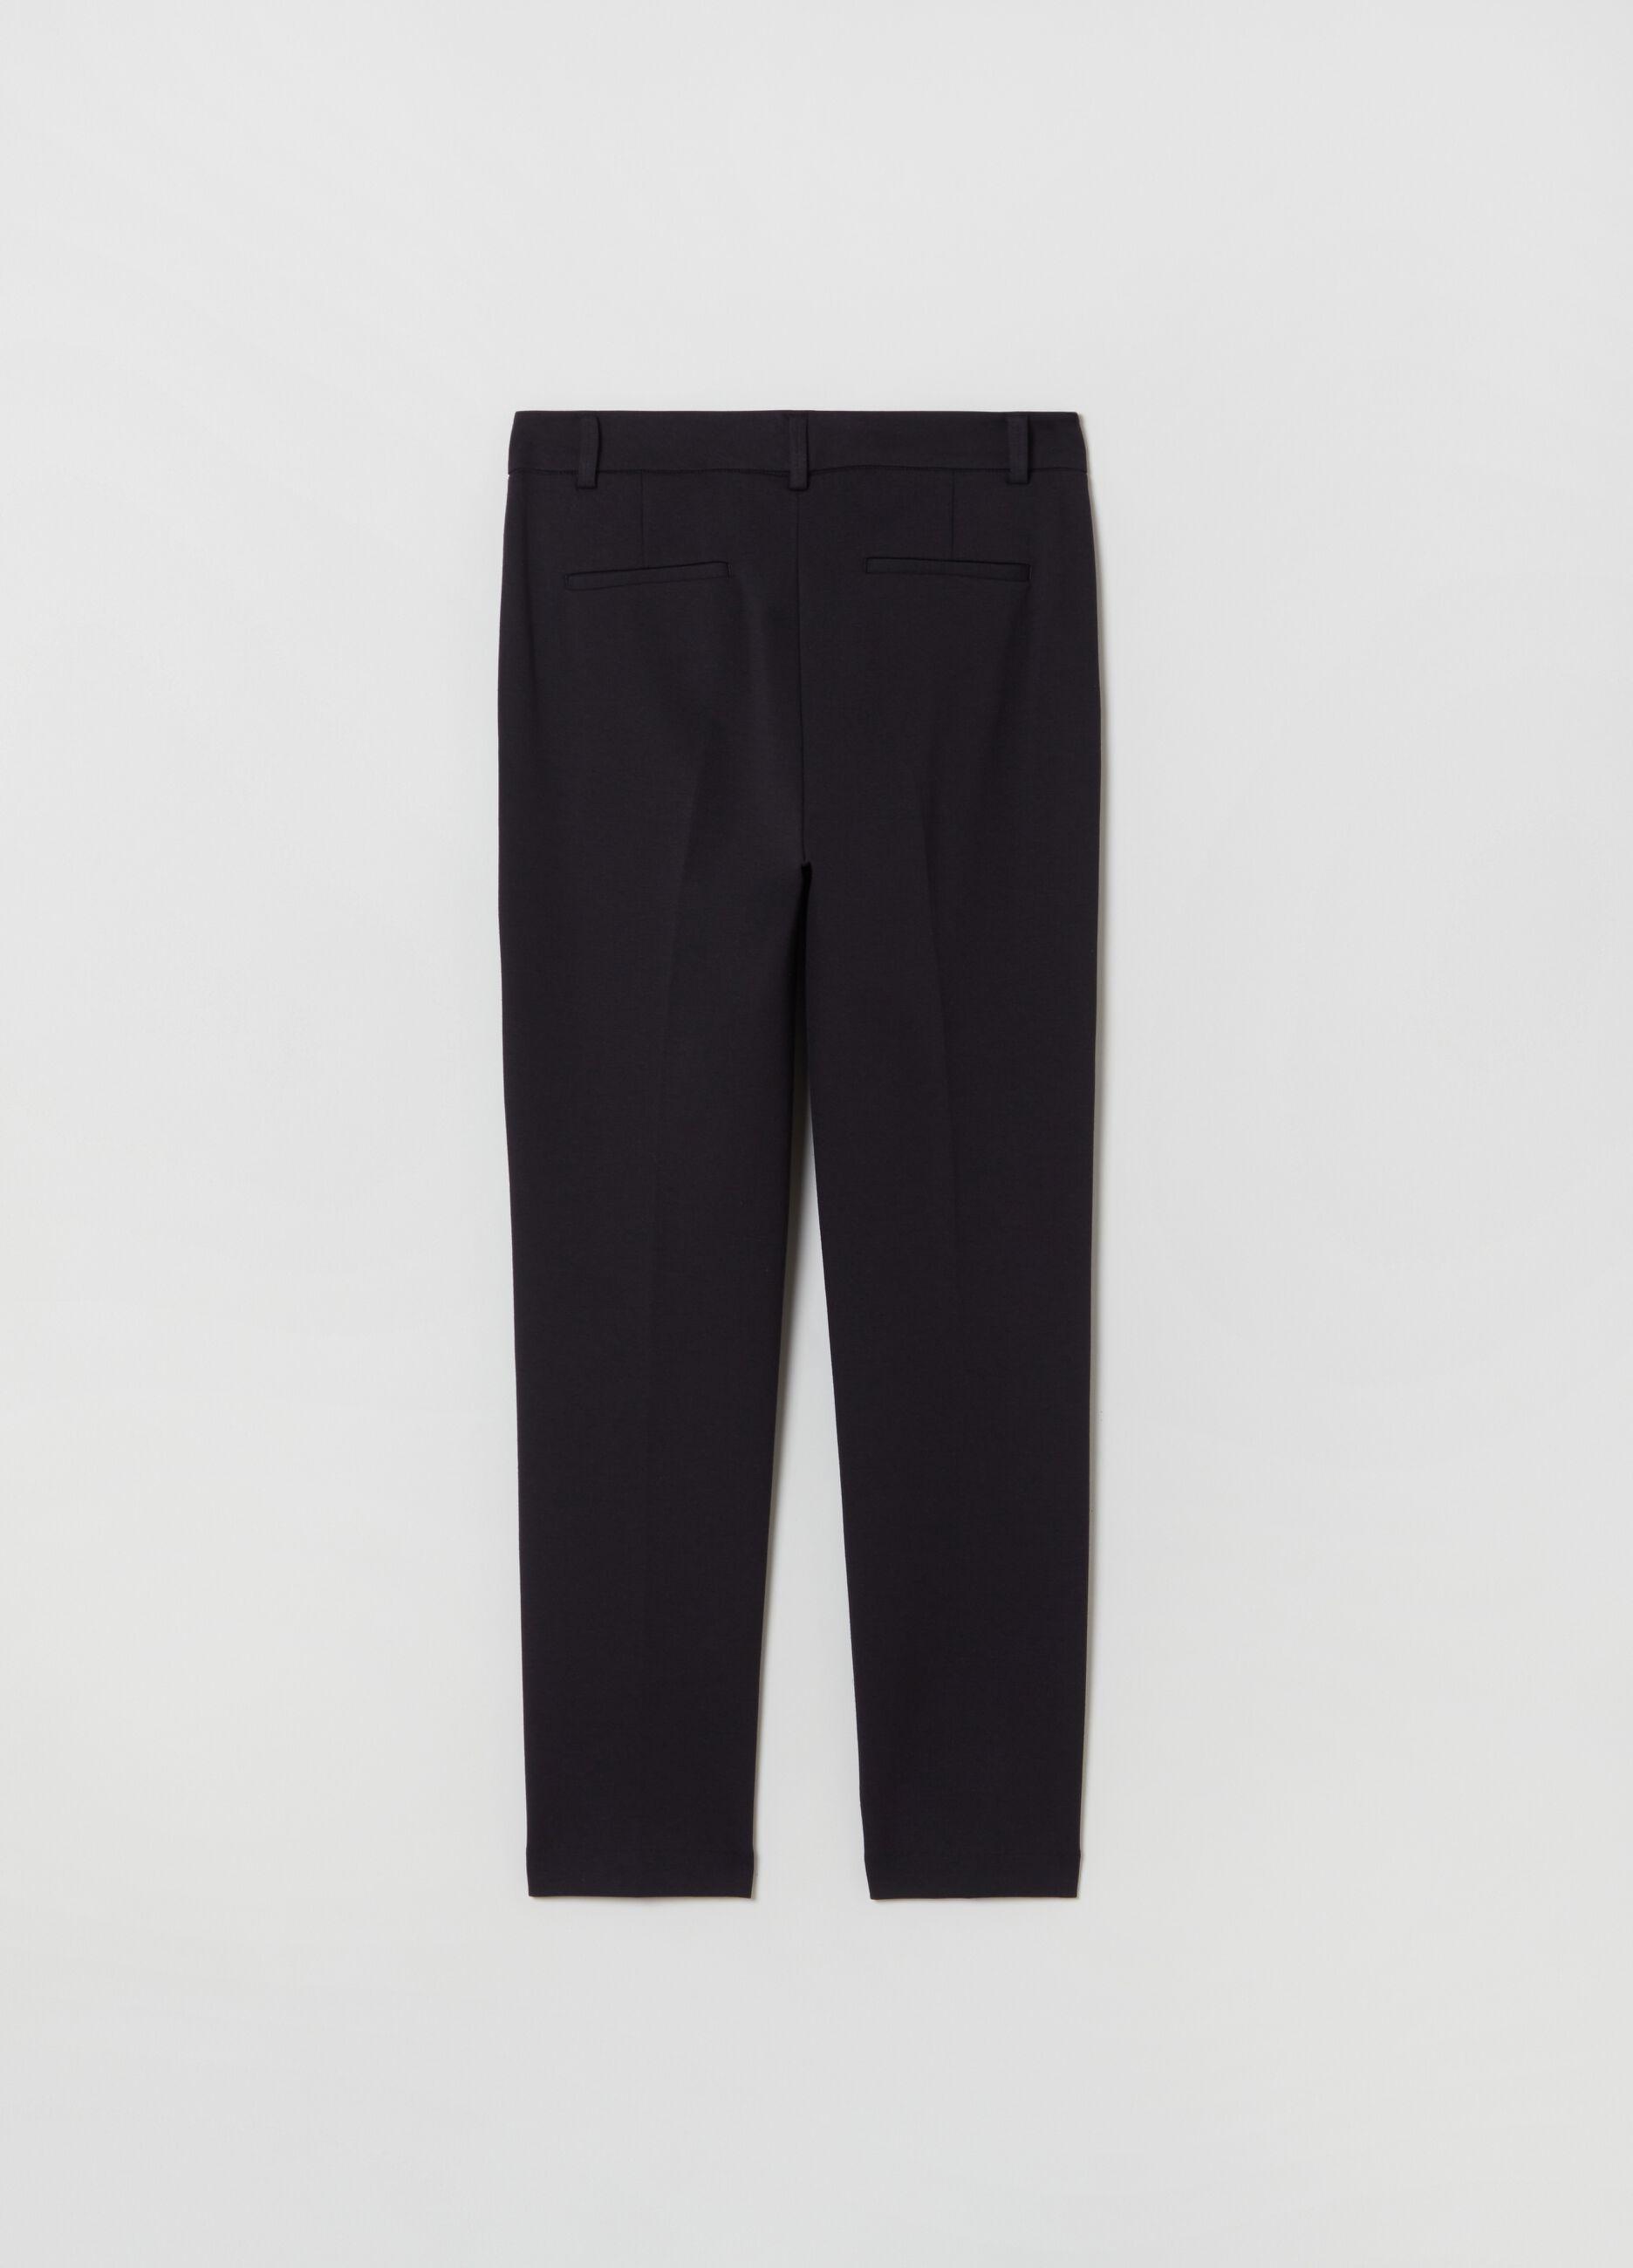 Slim-fit trousers in modal blend Black